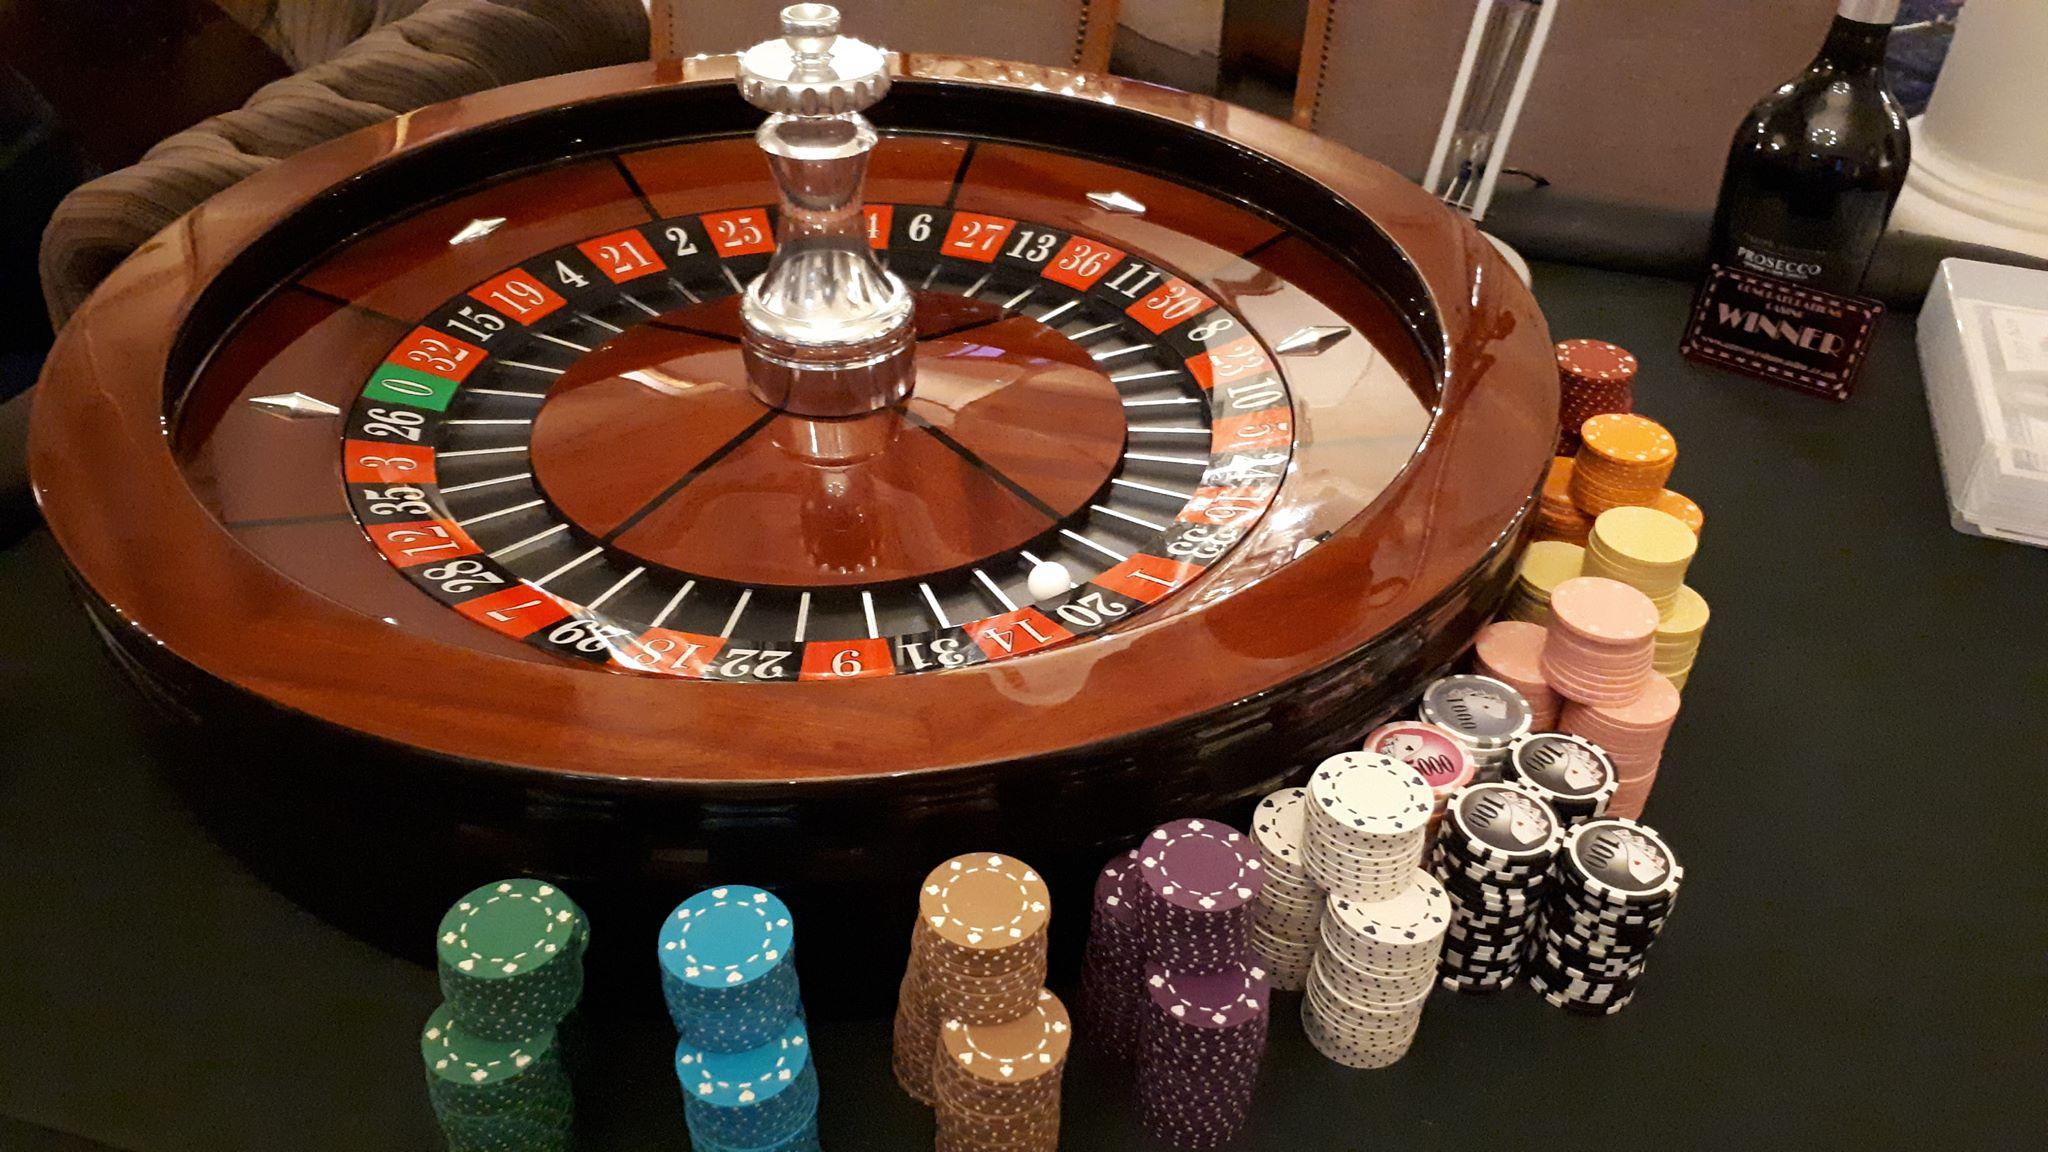 Fun Casino Hire Kent Blackjack, Roulette Weddings Birthdays Events Corporate Launches